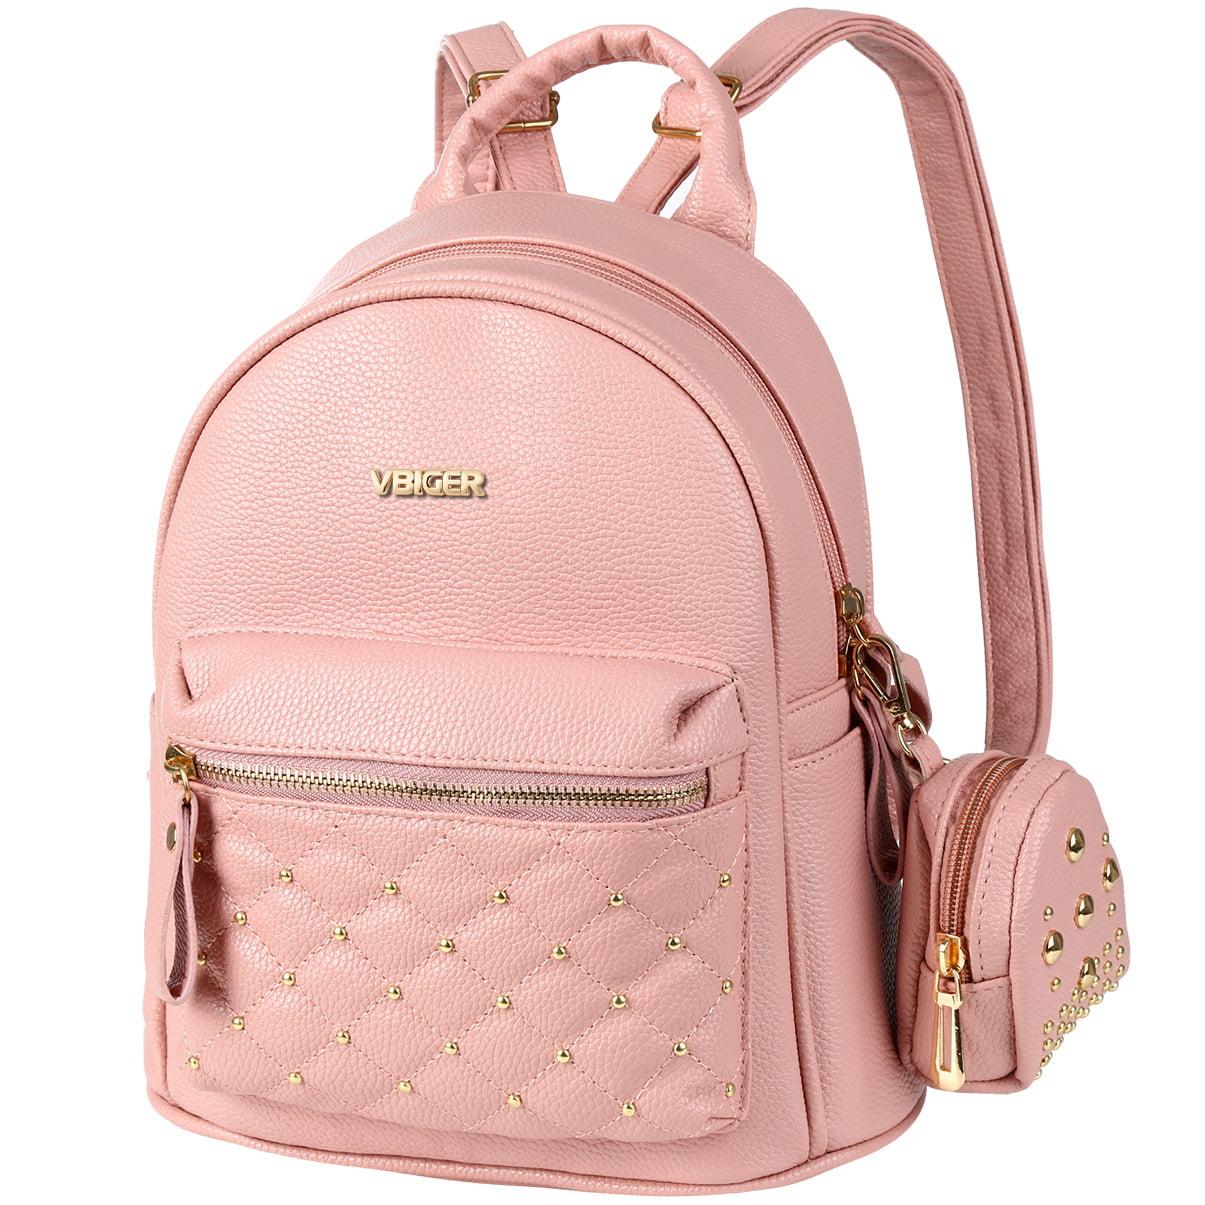 Cool Volleyball Sport Side Themed Casual Shoulders Backpack Travel Mini Bookbag Book Back School Bag For Girls Boy Women Men Merchandise